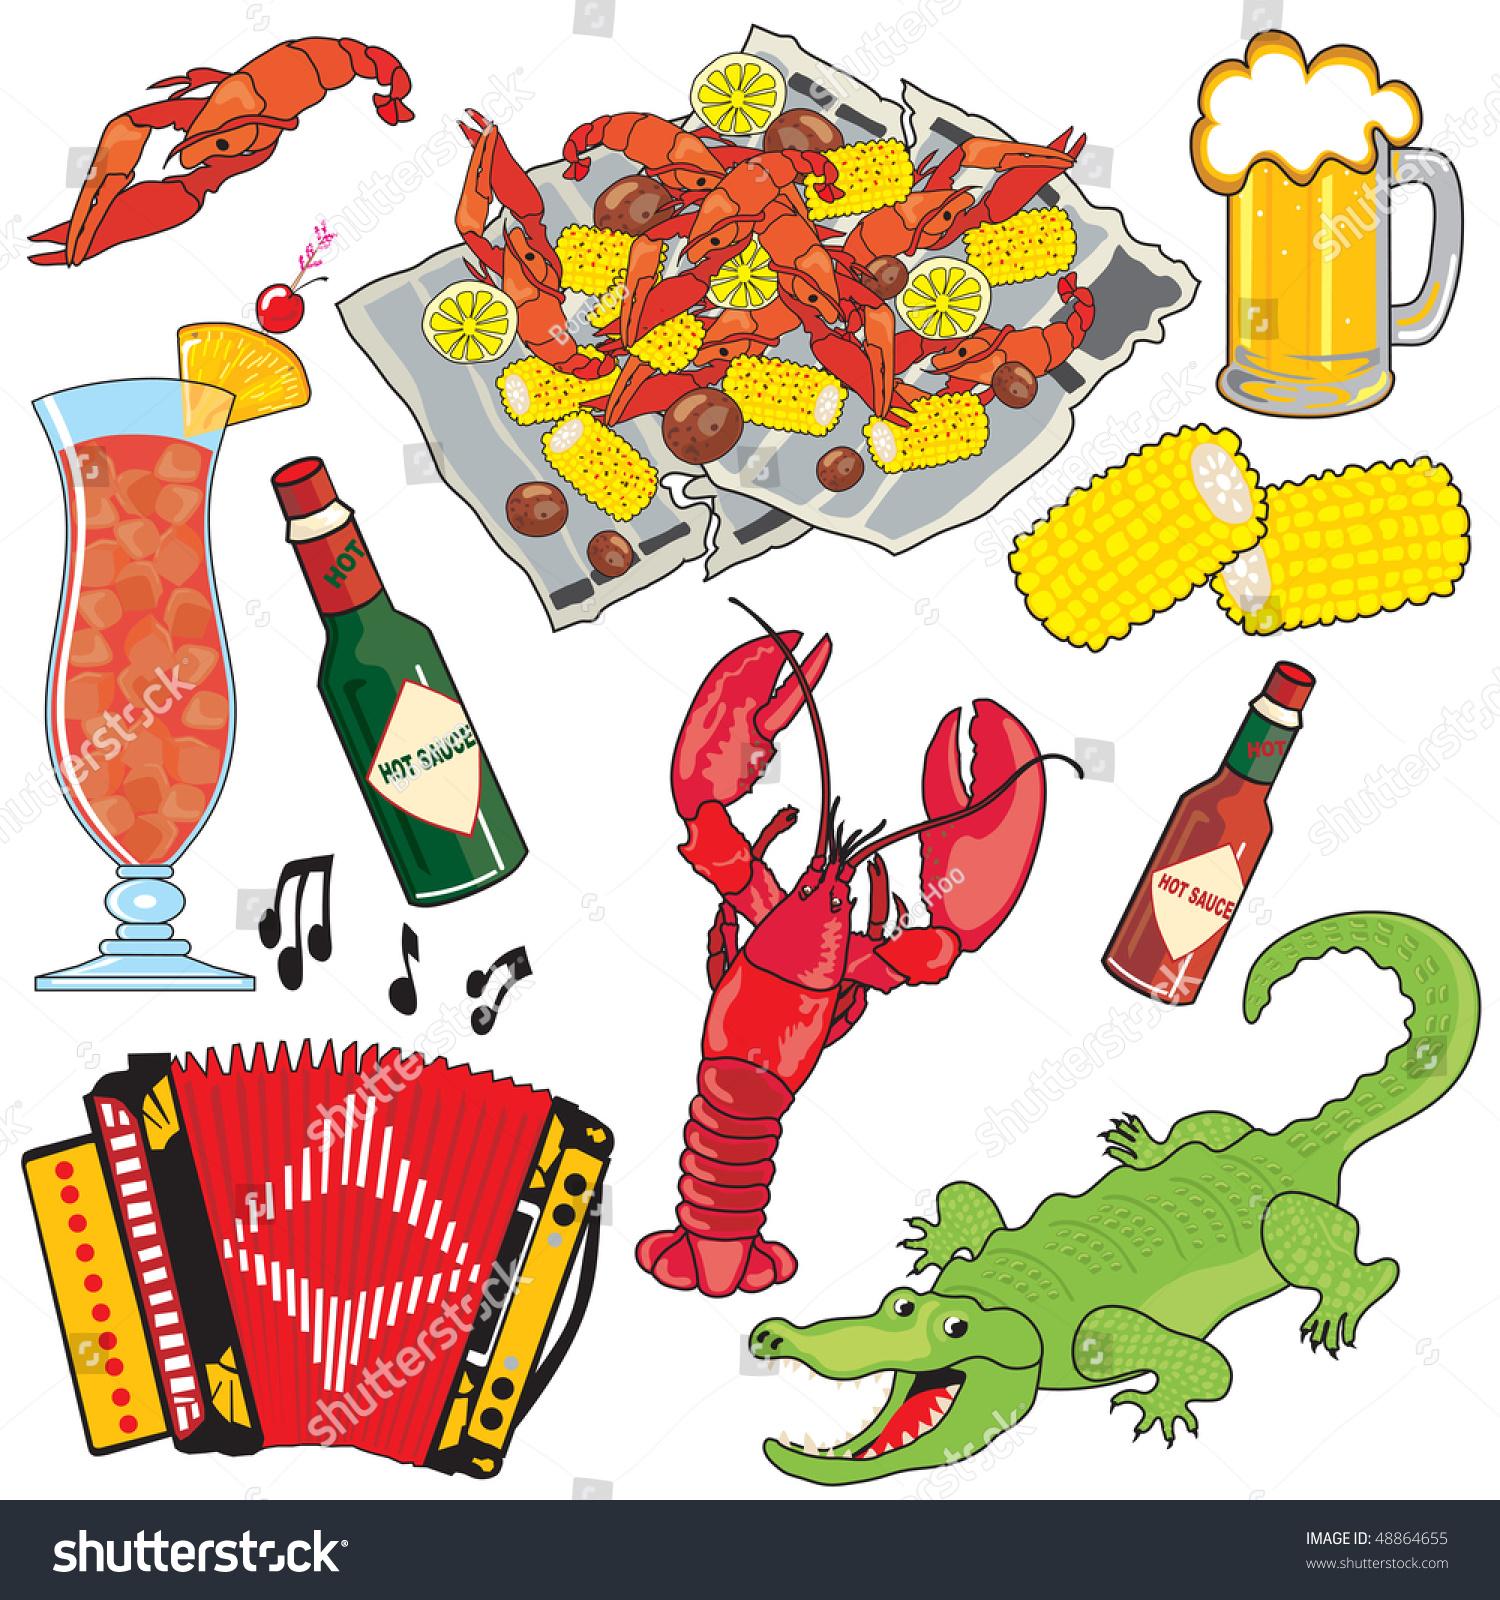 Louisiana Alligator Clip Art Cajun food, music and drinks clipart ...